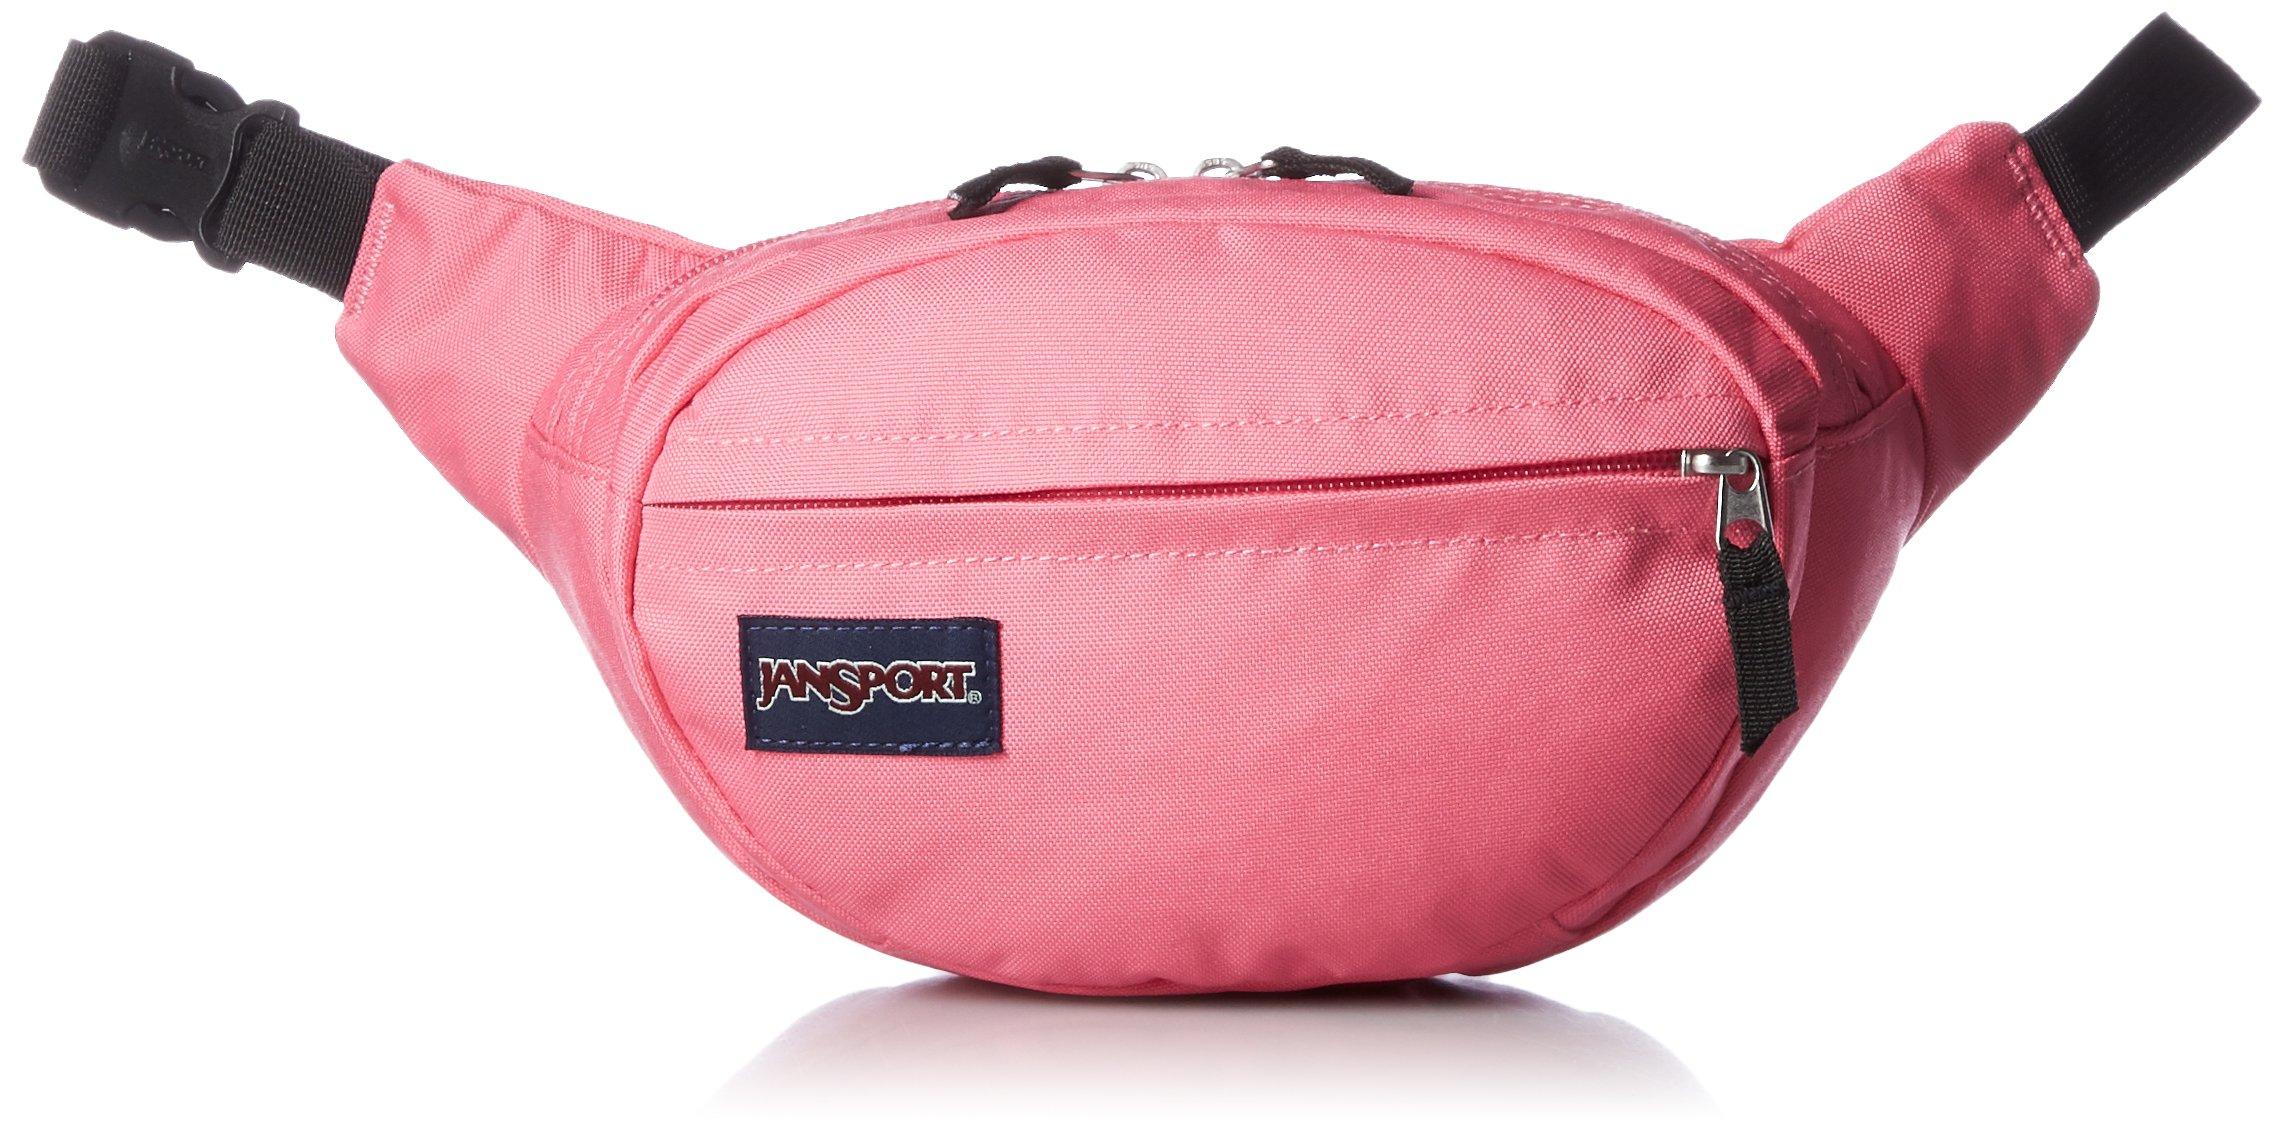 JanSport Unisex Fifth Avenue Lipstick Kiss Backpack